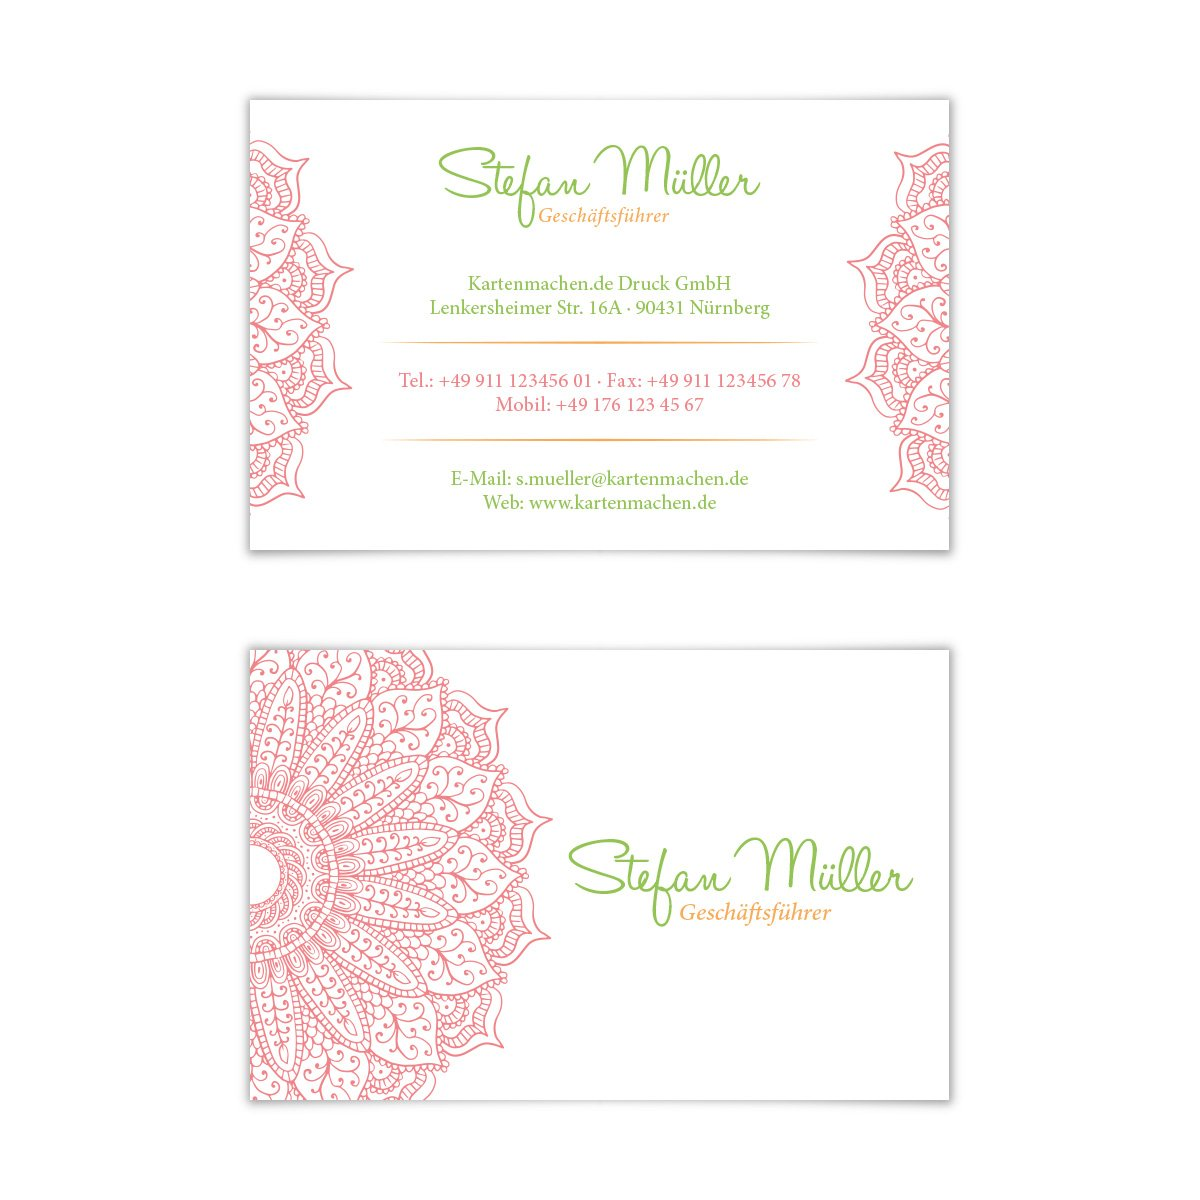 100 x Visitenkarten individuell Business Karten 300g/qm 85 x 55 mm - Erfrischende Blume Kartenmachen.de